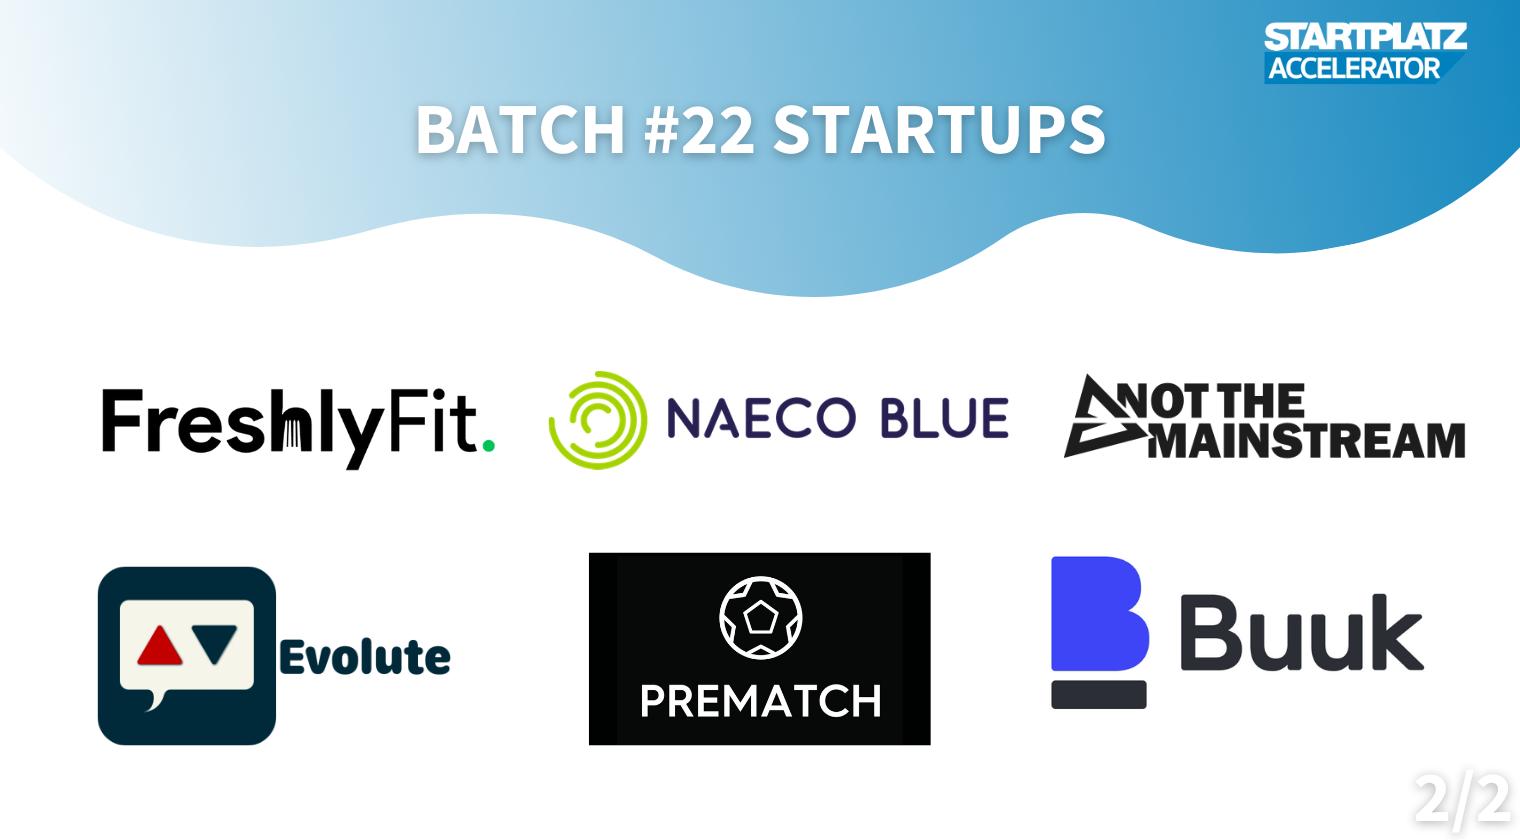 startupsbatch22